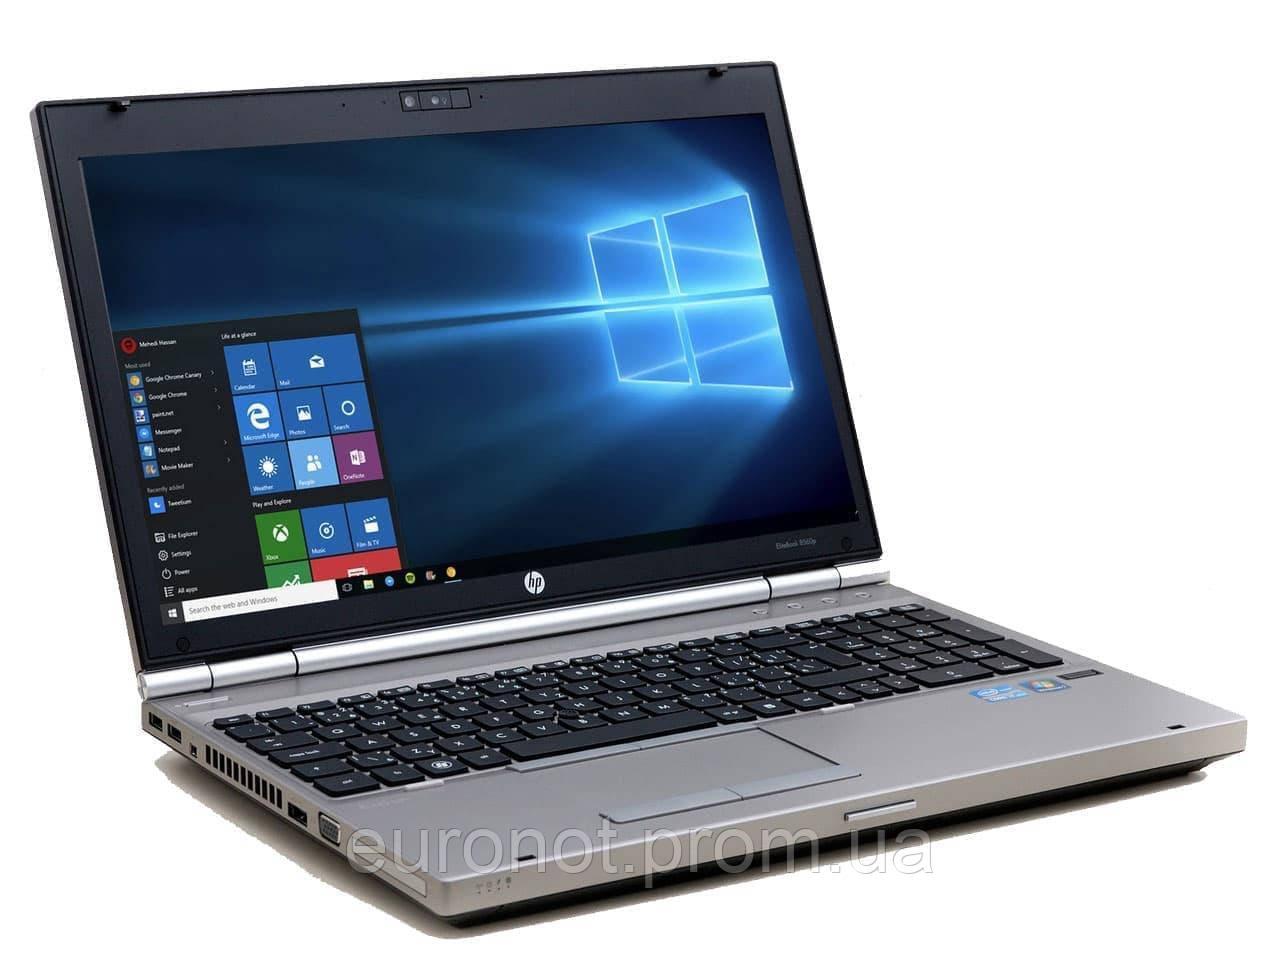 Ноутбук HP EliteBook 8560p (i7-2620M|8GB|120SSD)